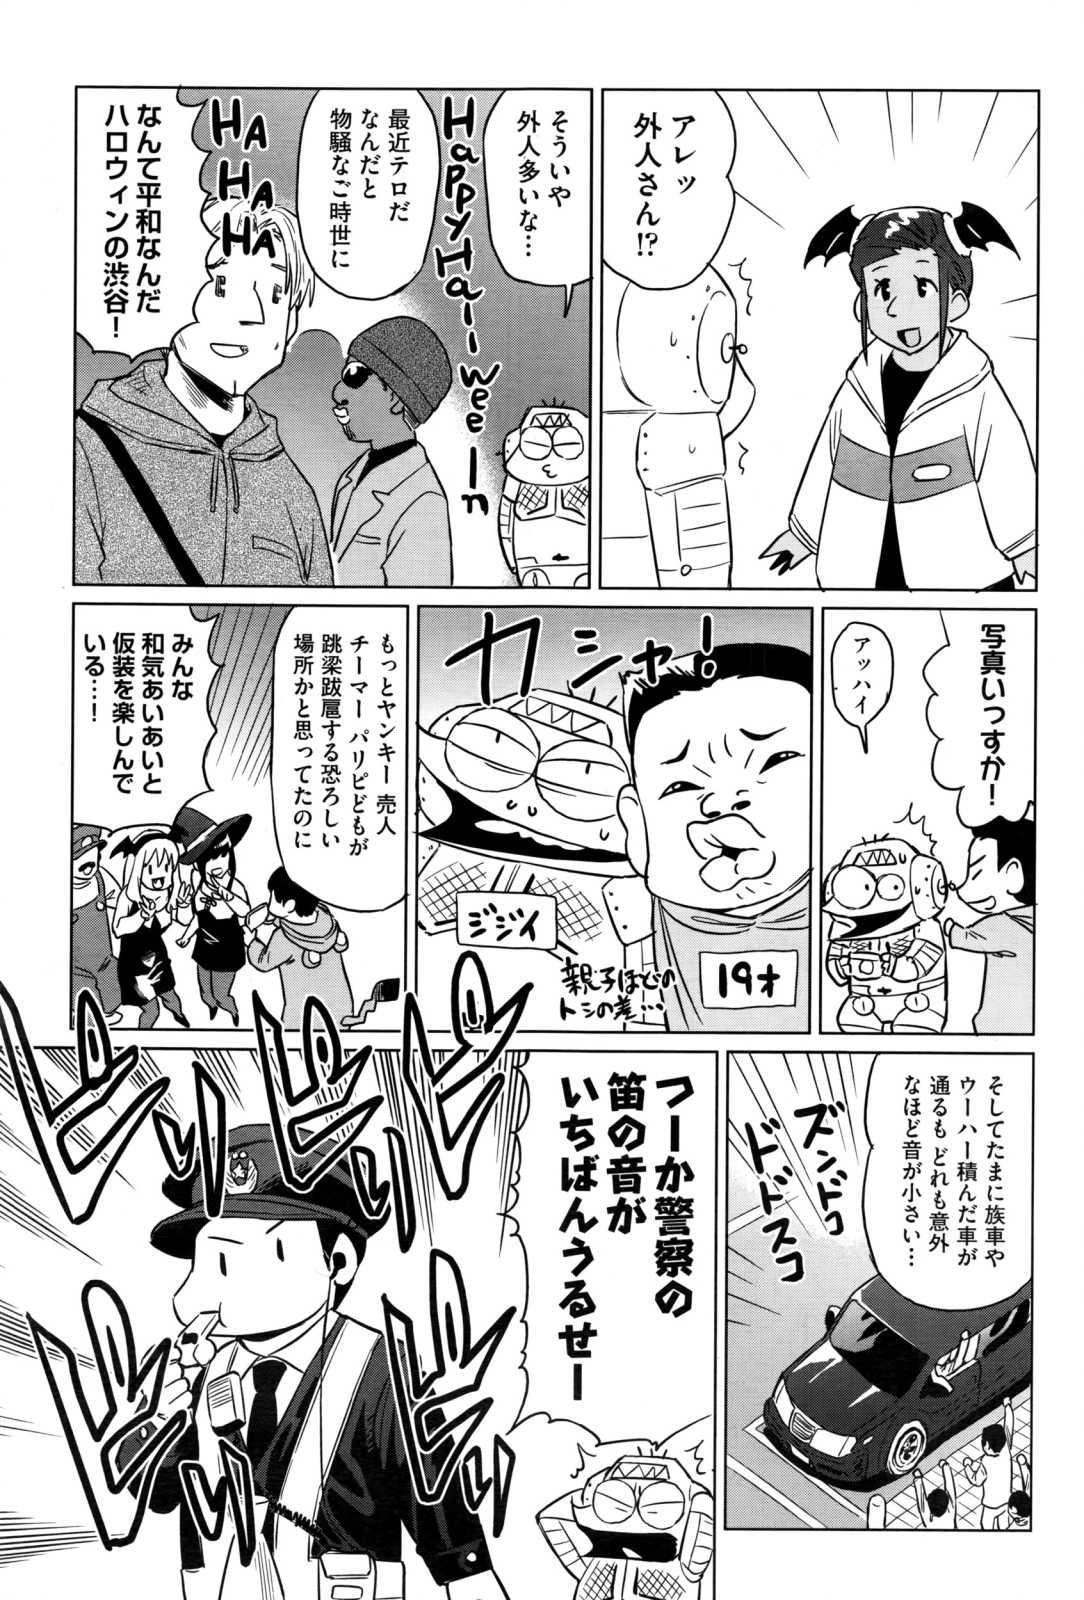 COMIC AUN 2017-01 519